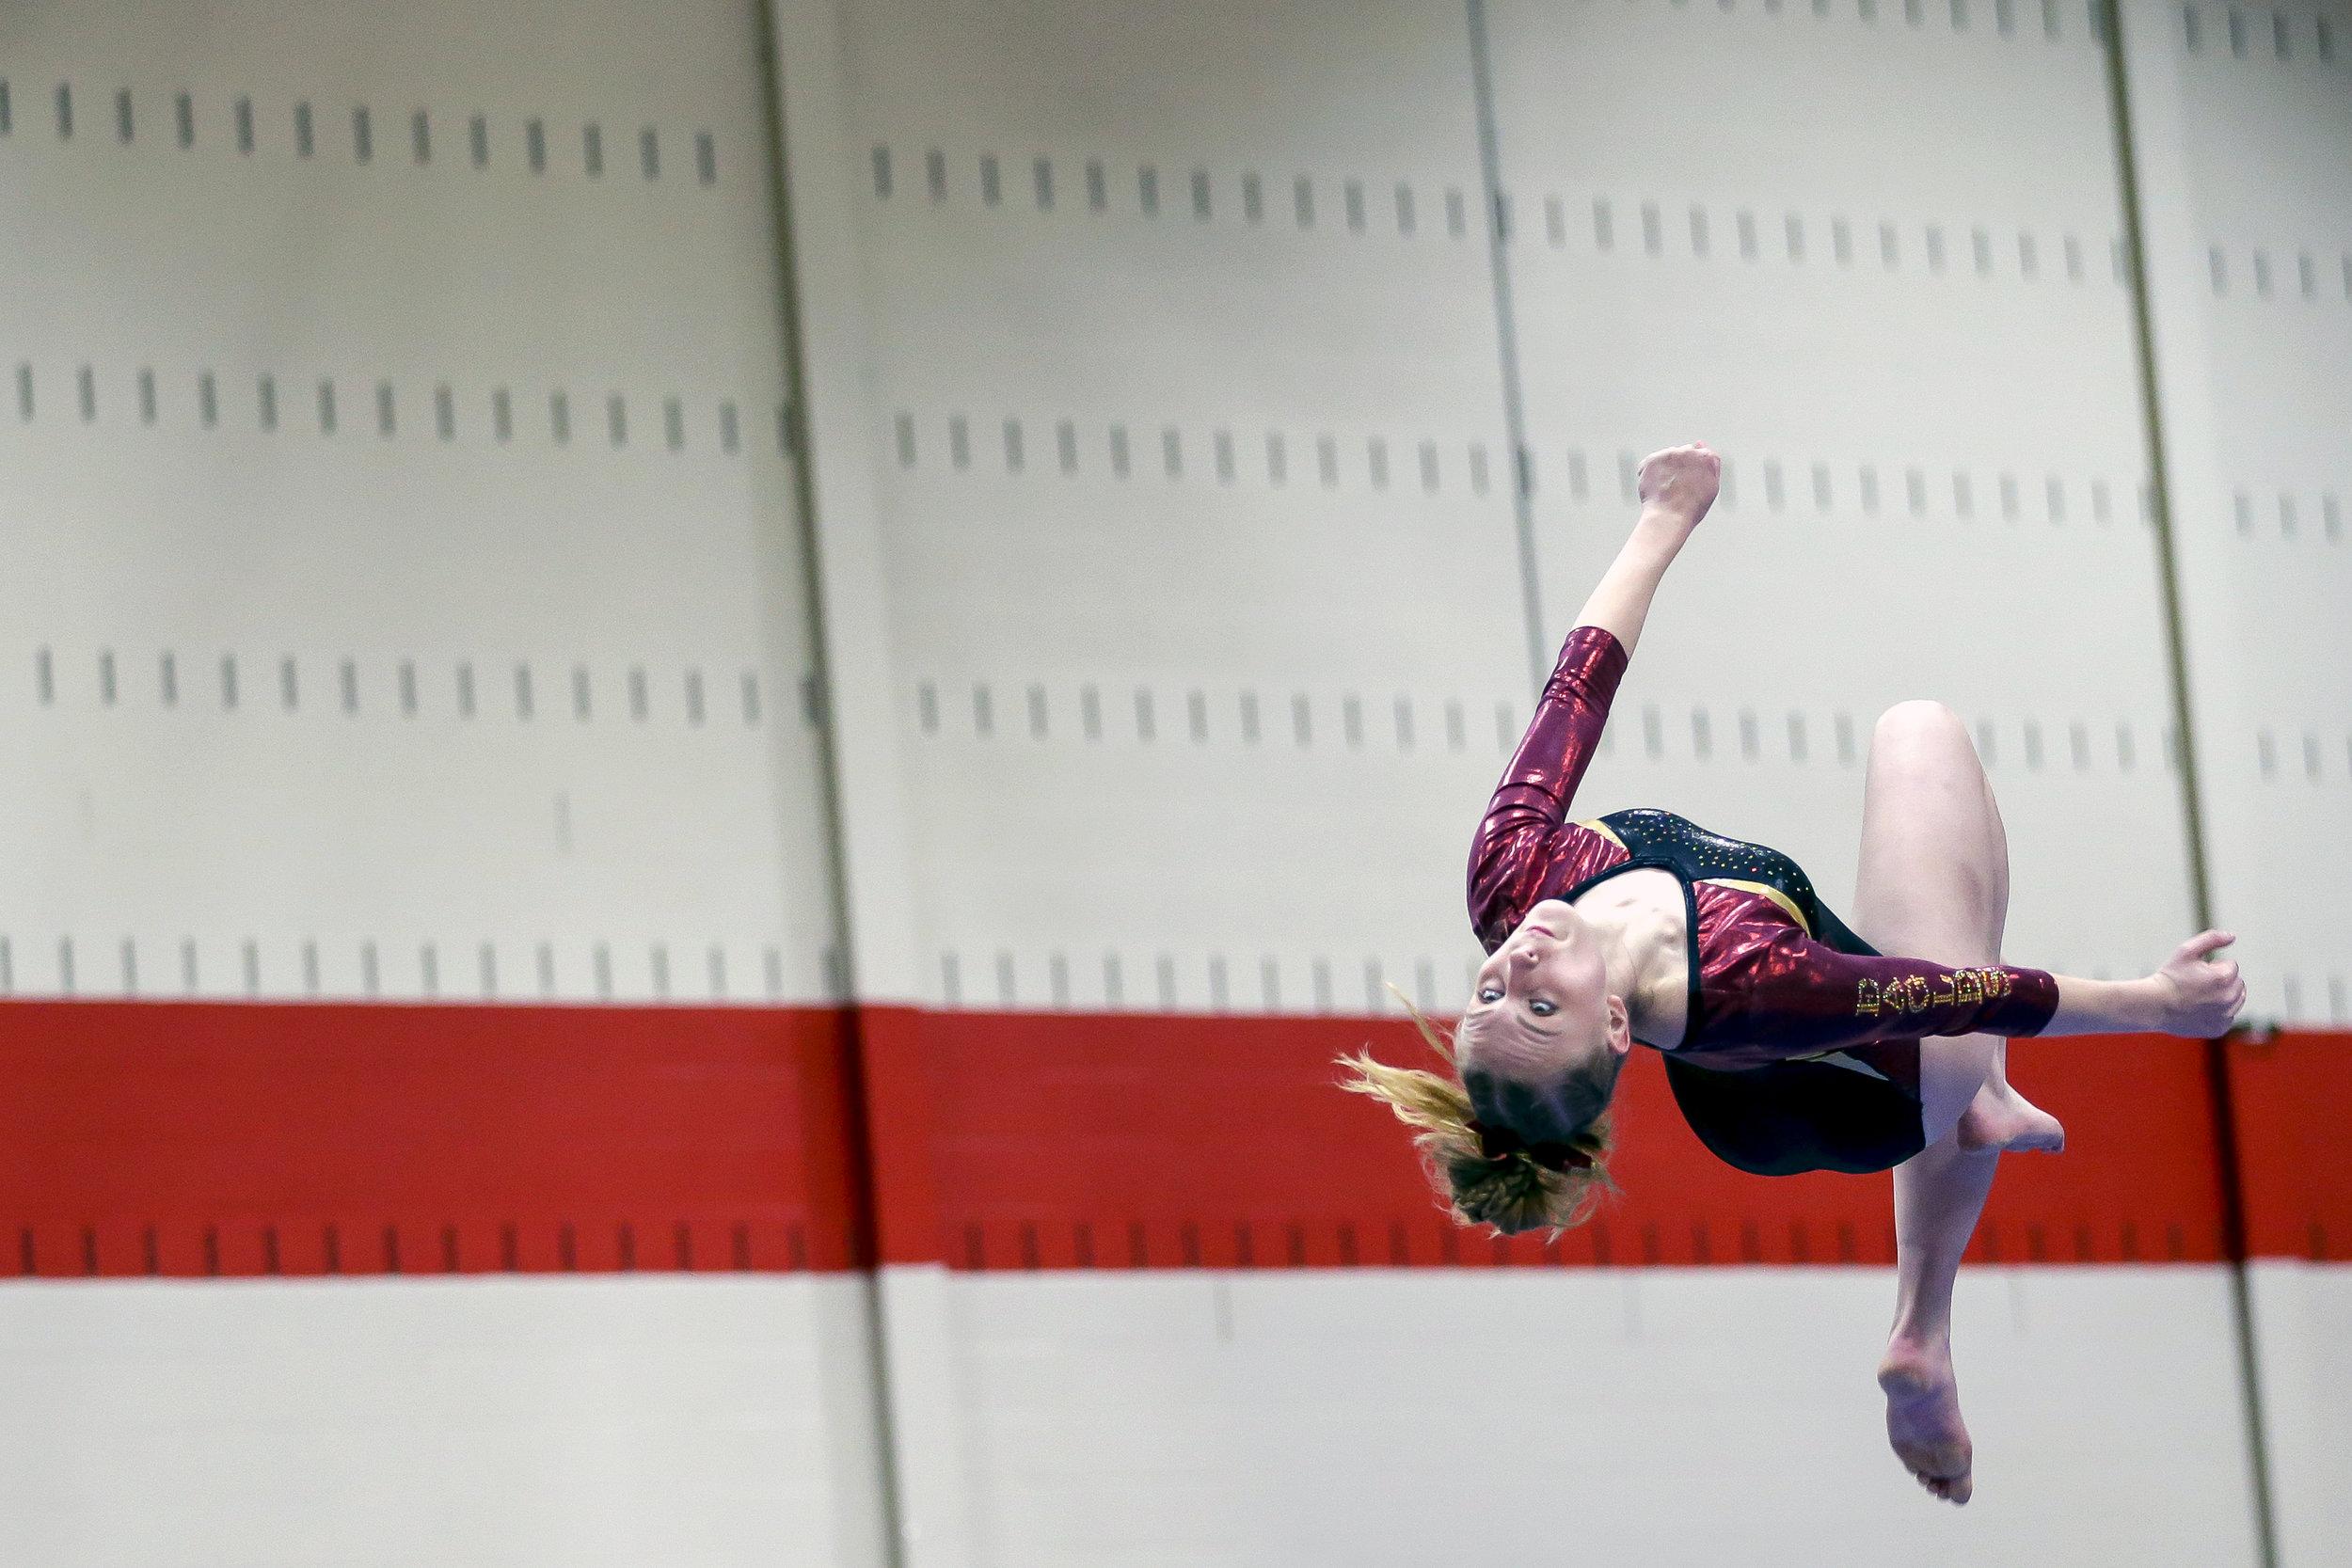 030218 general - state gymnastics 2018 team competition 09.jpg